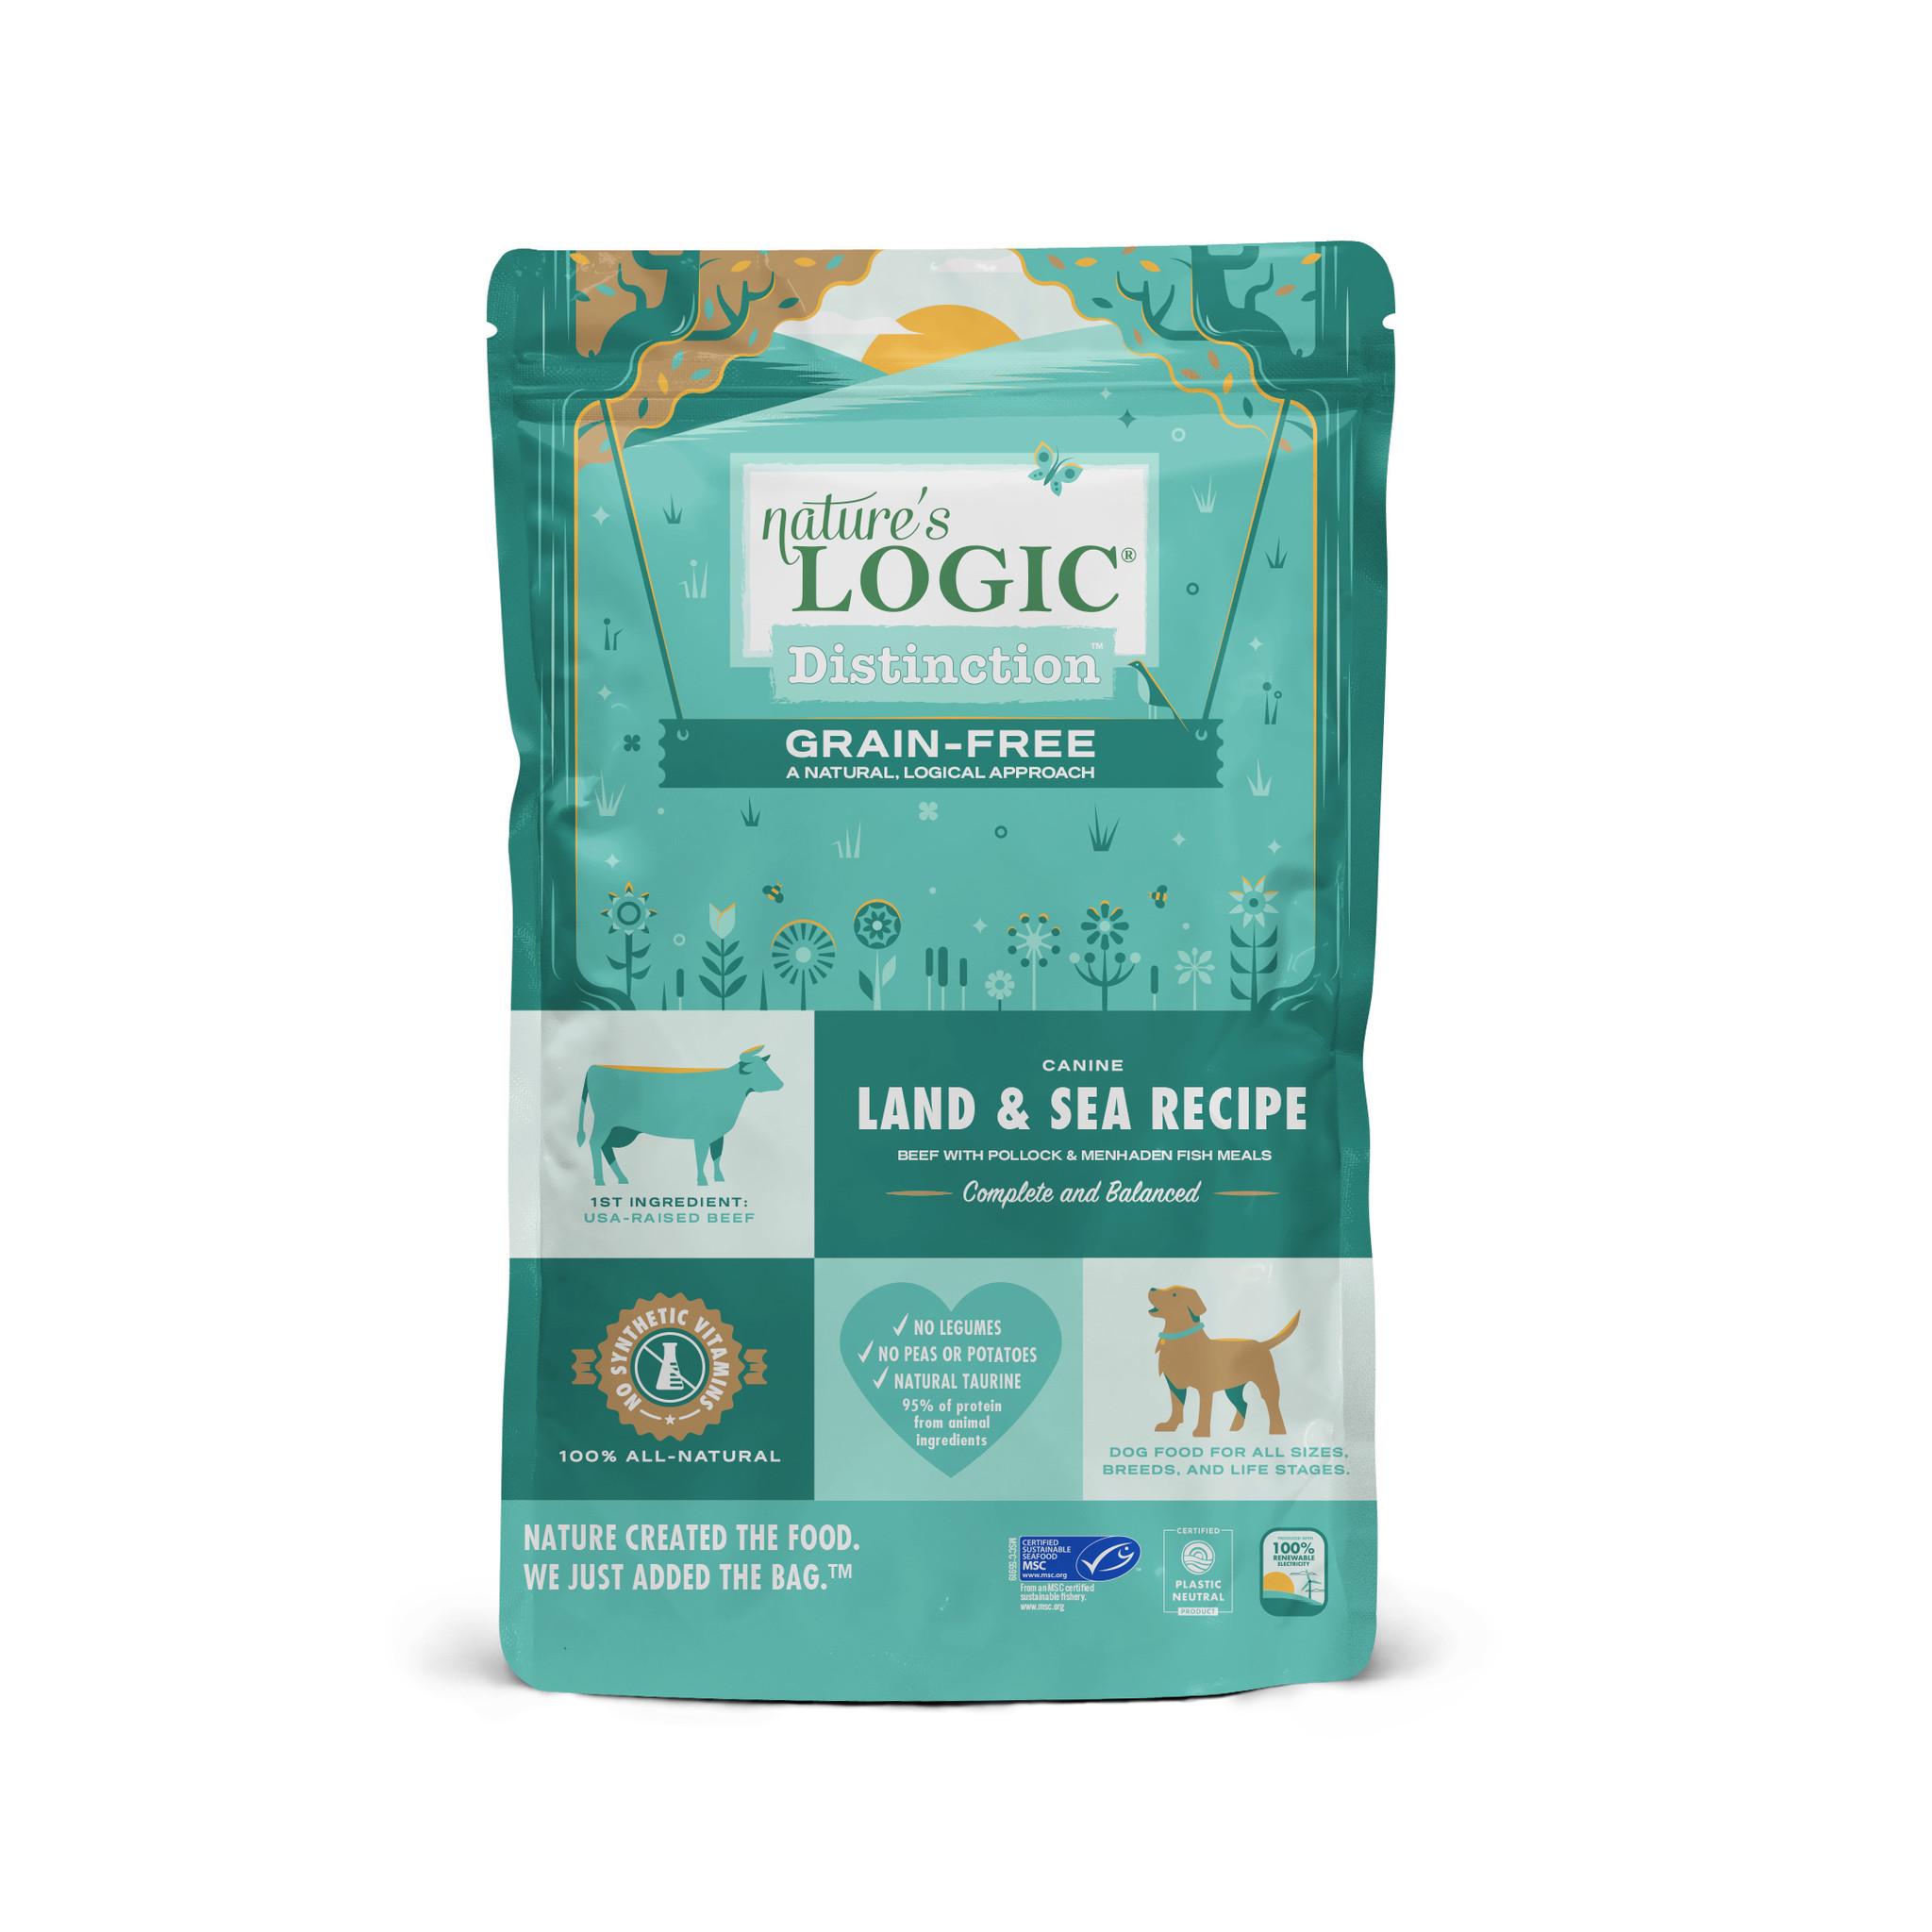 Nature's Logic Nature's Logic Distinction Grain Free Land & Sea Recipe Dry Dog Food